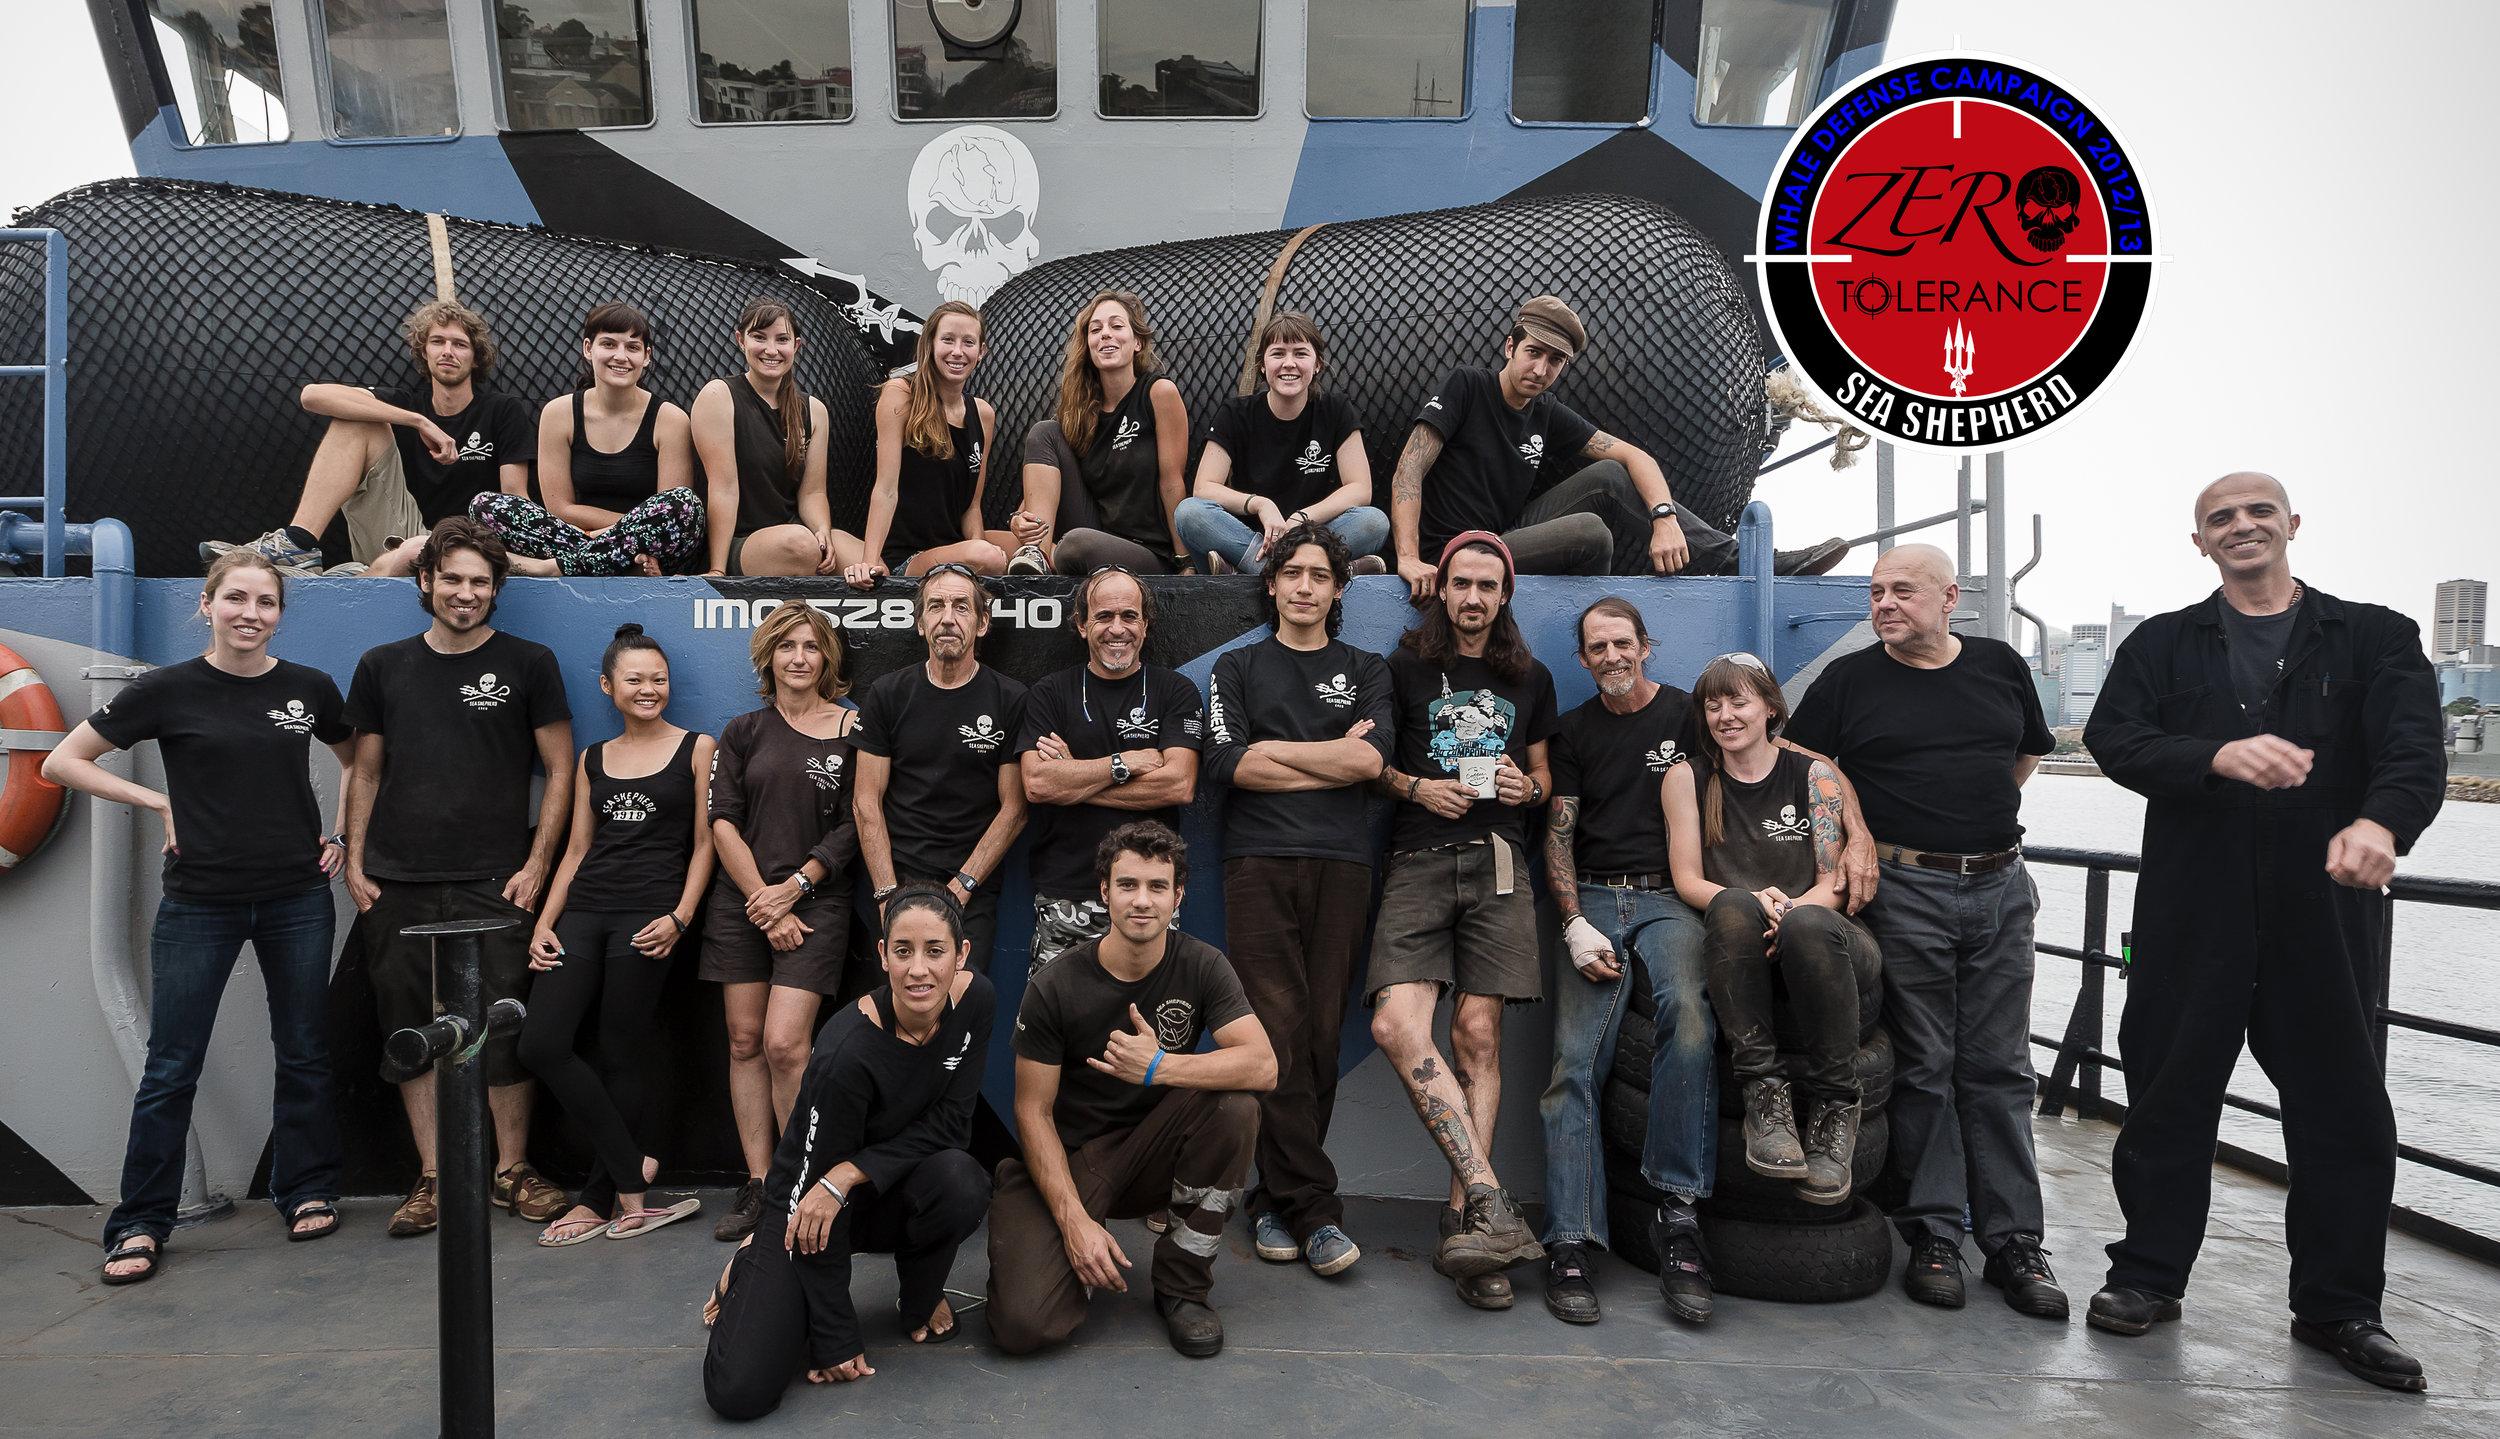 Our Sea Shepherd Antarctica Crew Shot